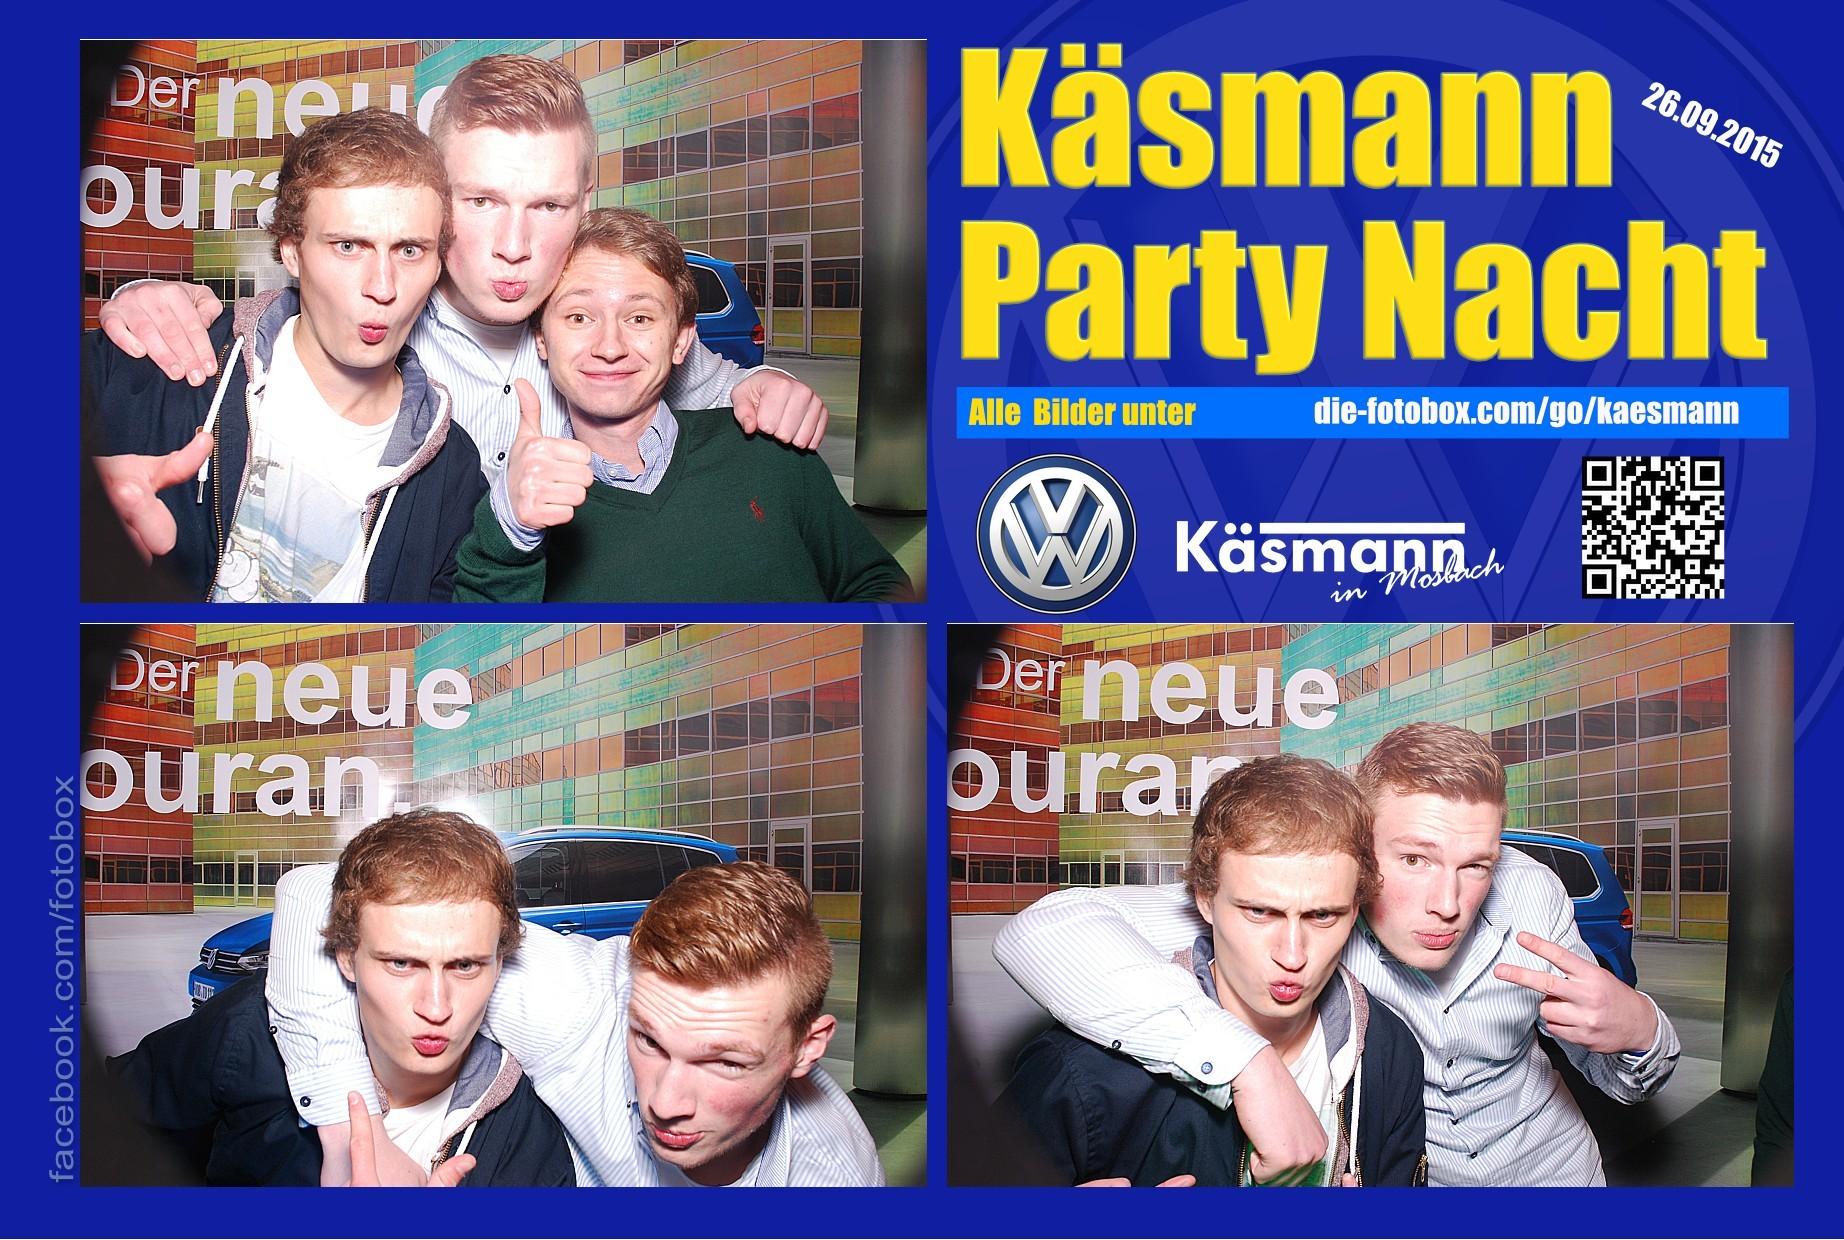 Käsmannparty 2015 - www.die-fotobox.com 01160